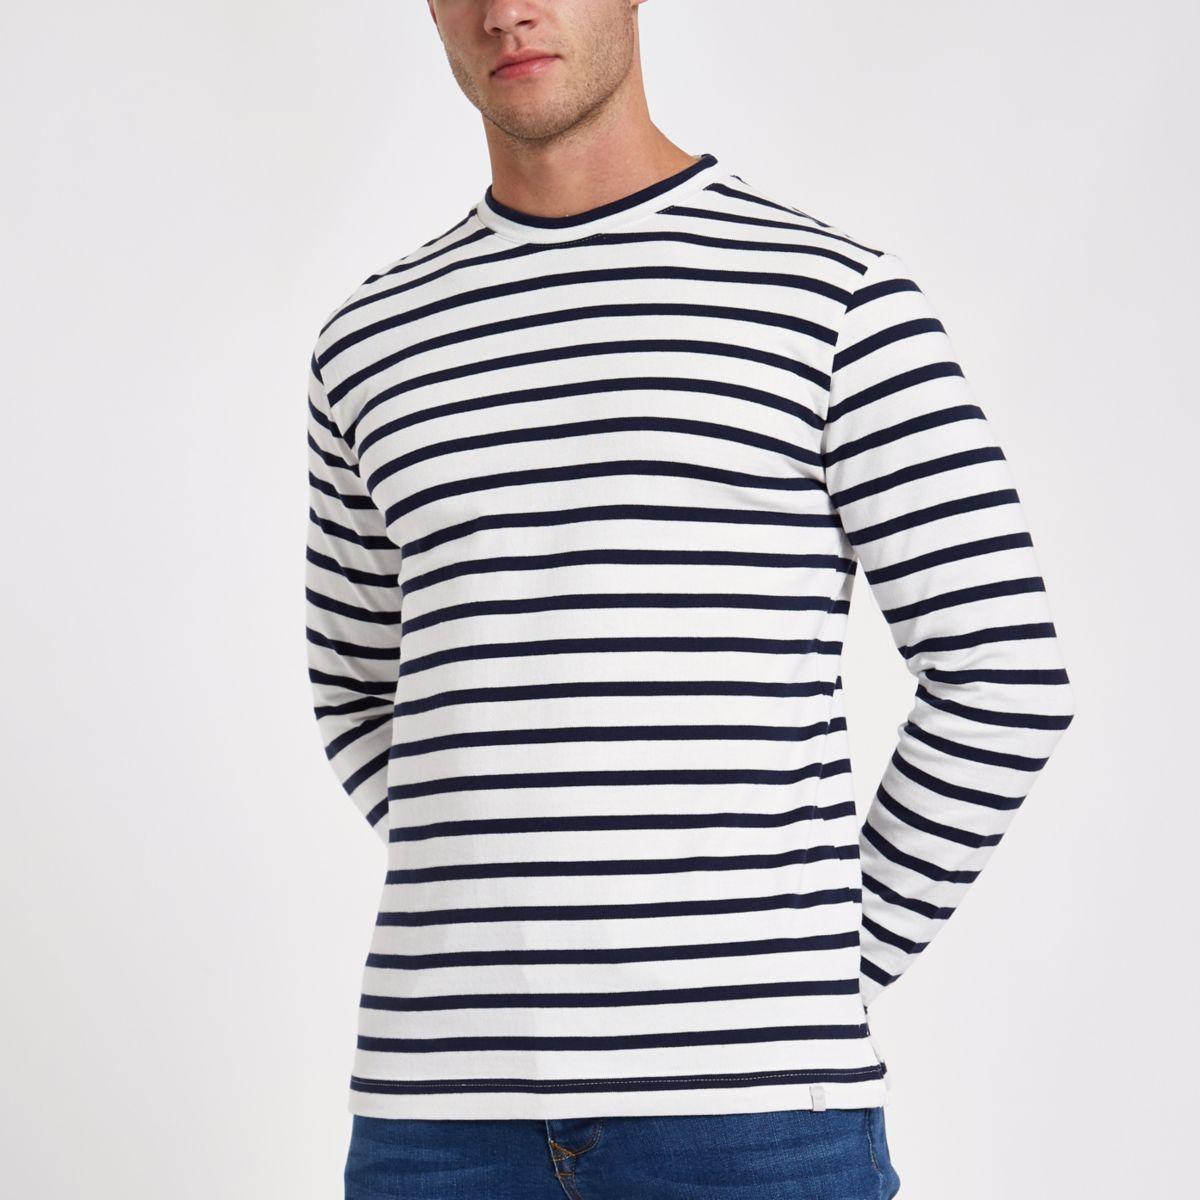 Minimum navy stripe long sleeve top